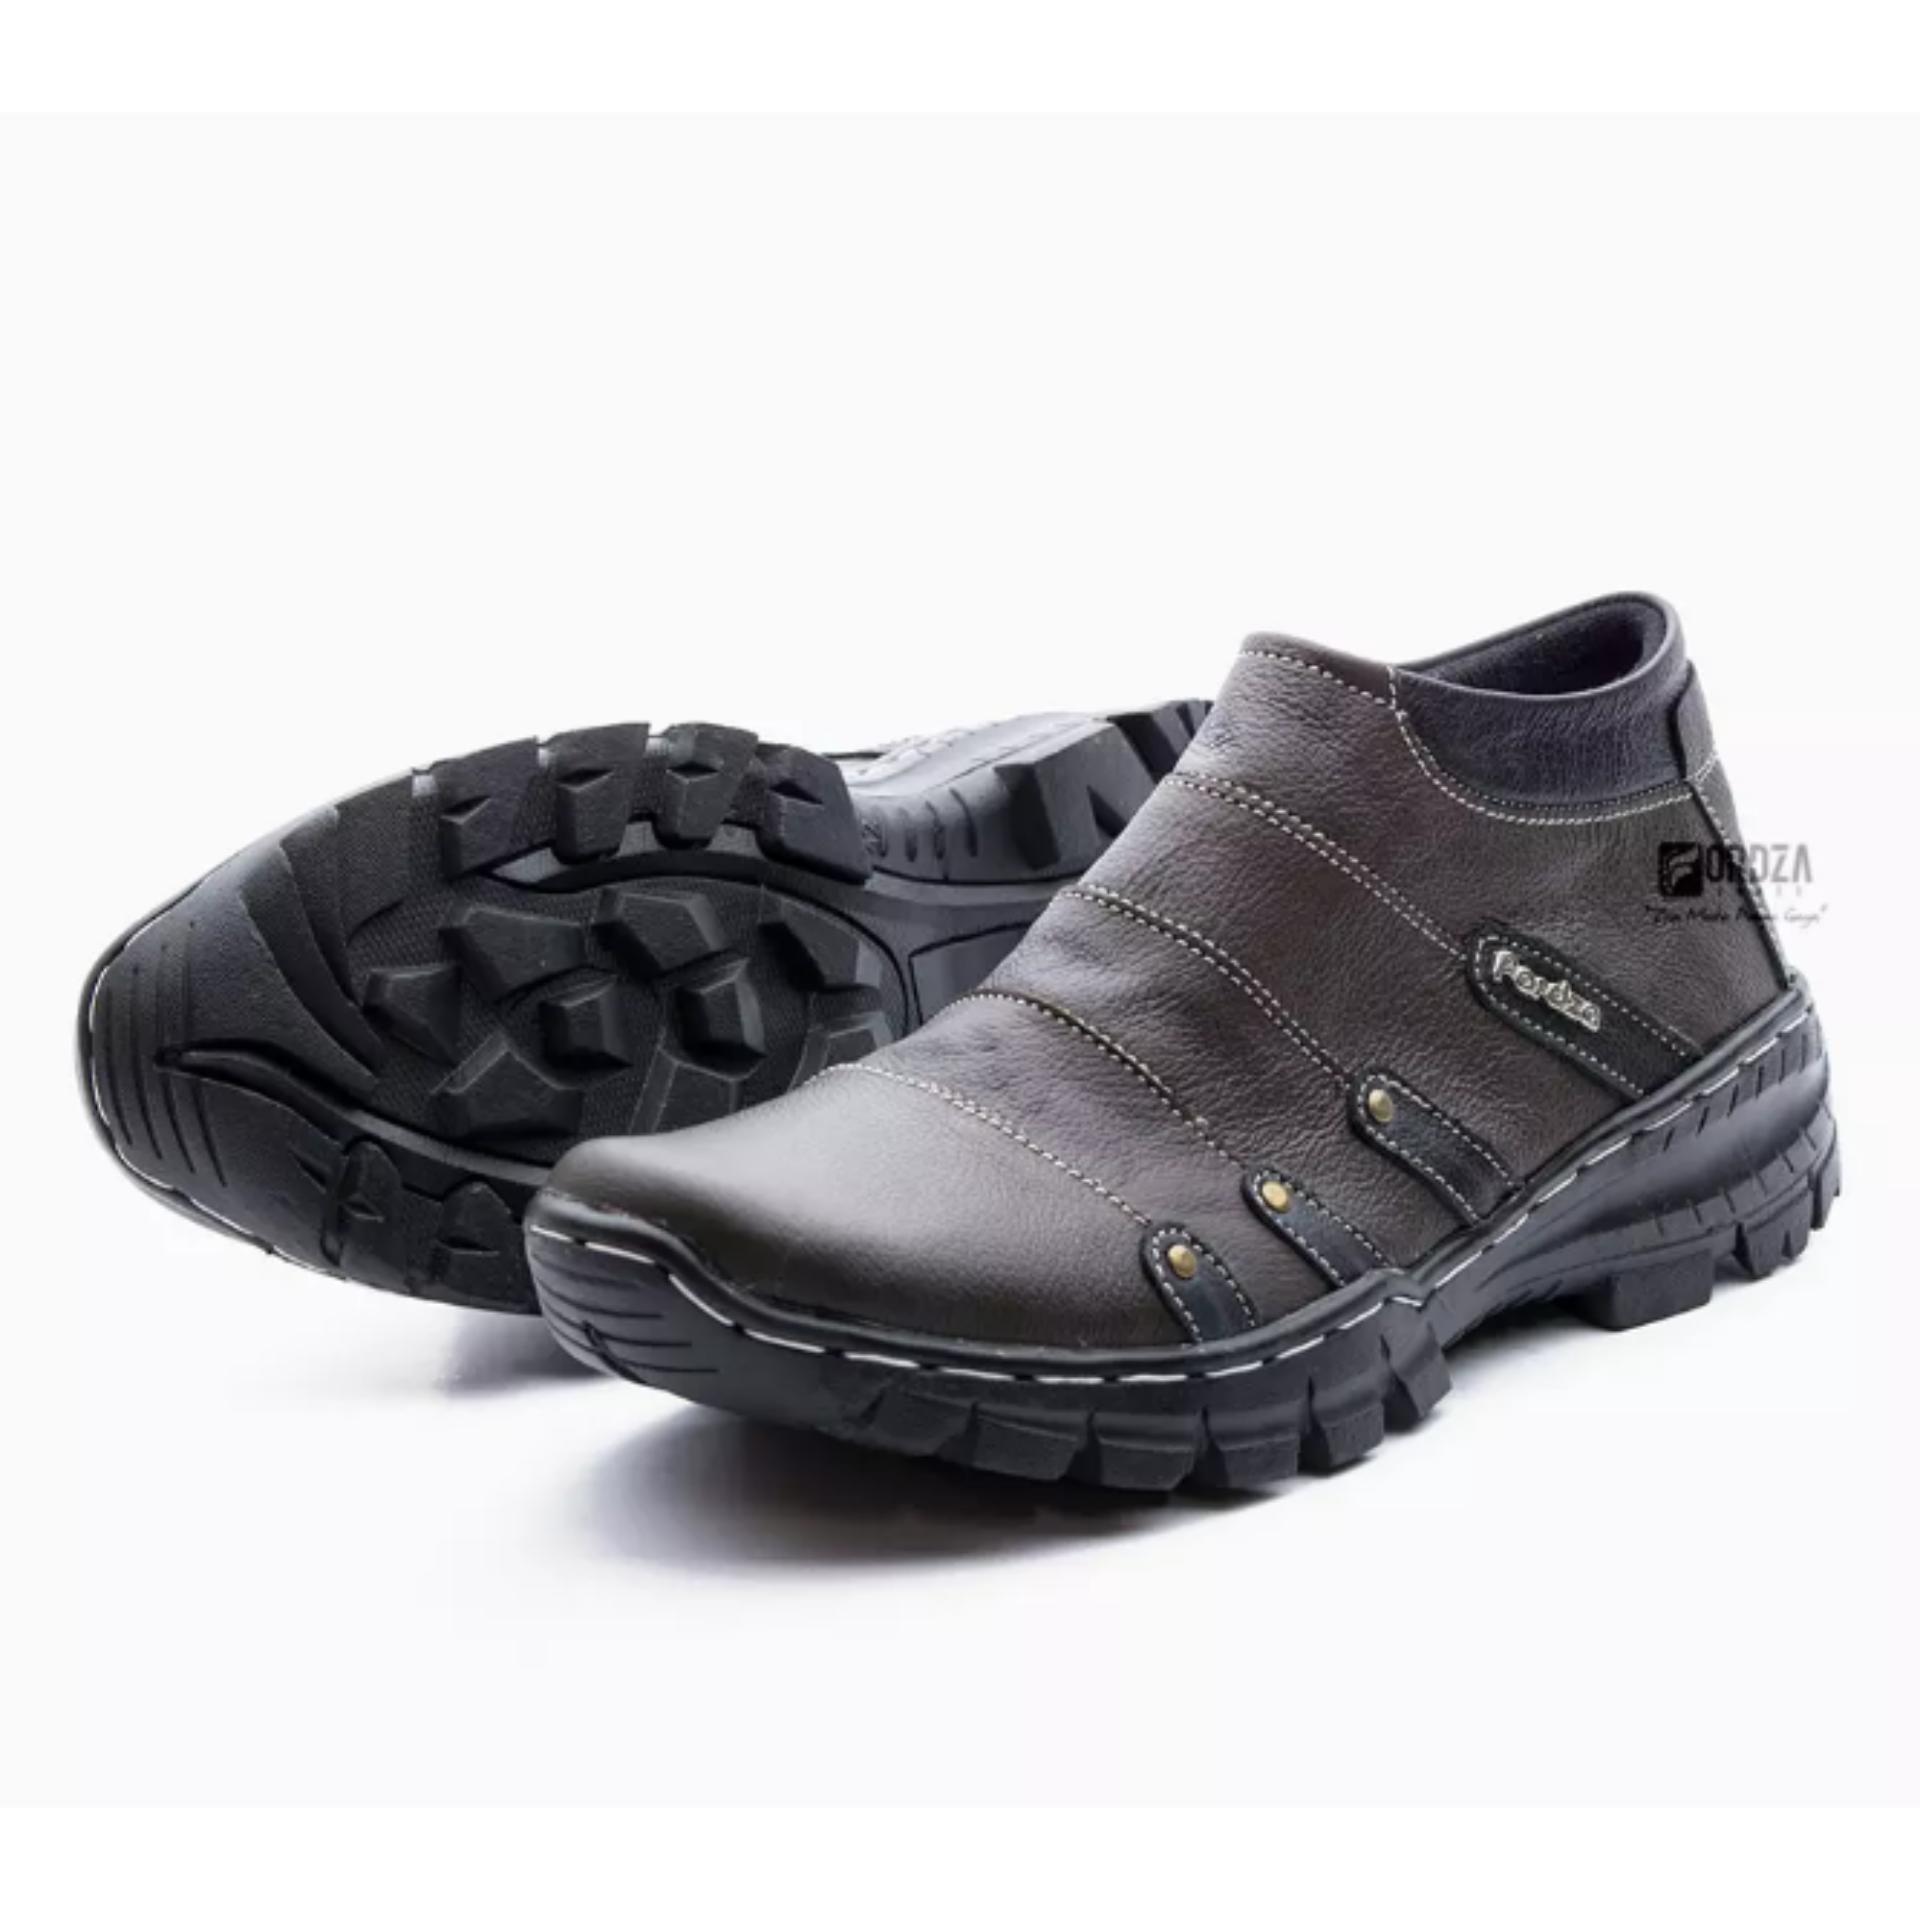 Spesifikasi Sepatu Boot Pria Boots Touring Casual Kulit Asli Resleting Non Safety Handmade Fordza Bks07 Terbaru